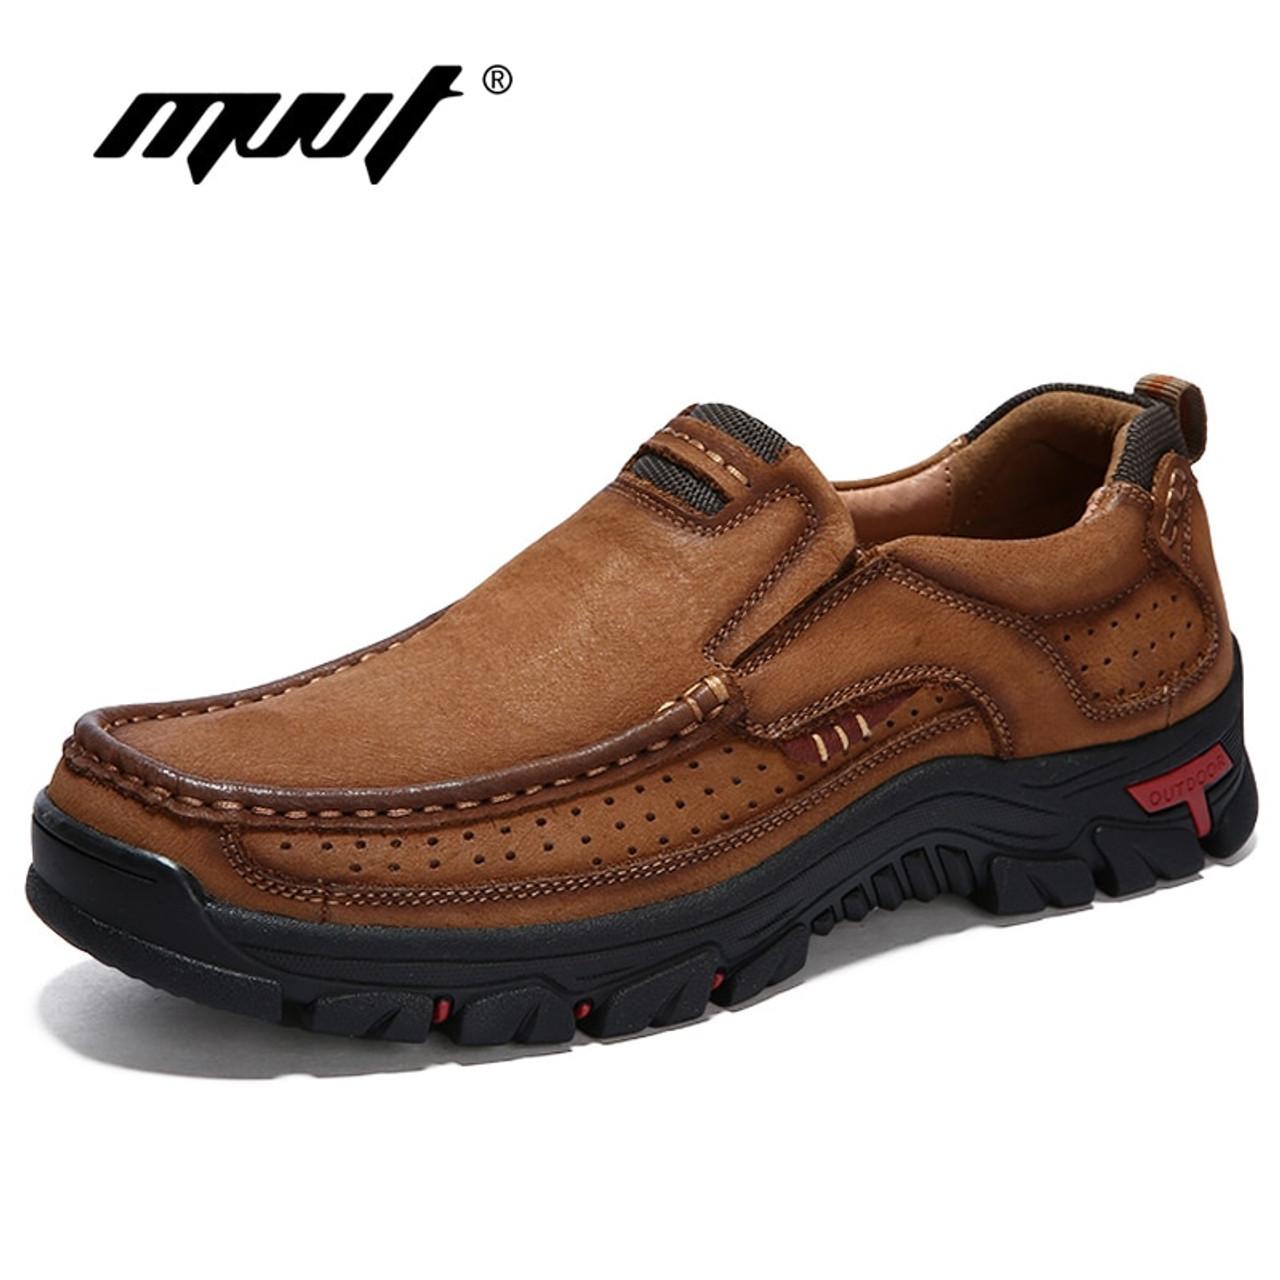 MVVT 100% Genuine Leather Shoes Men Cow